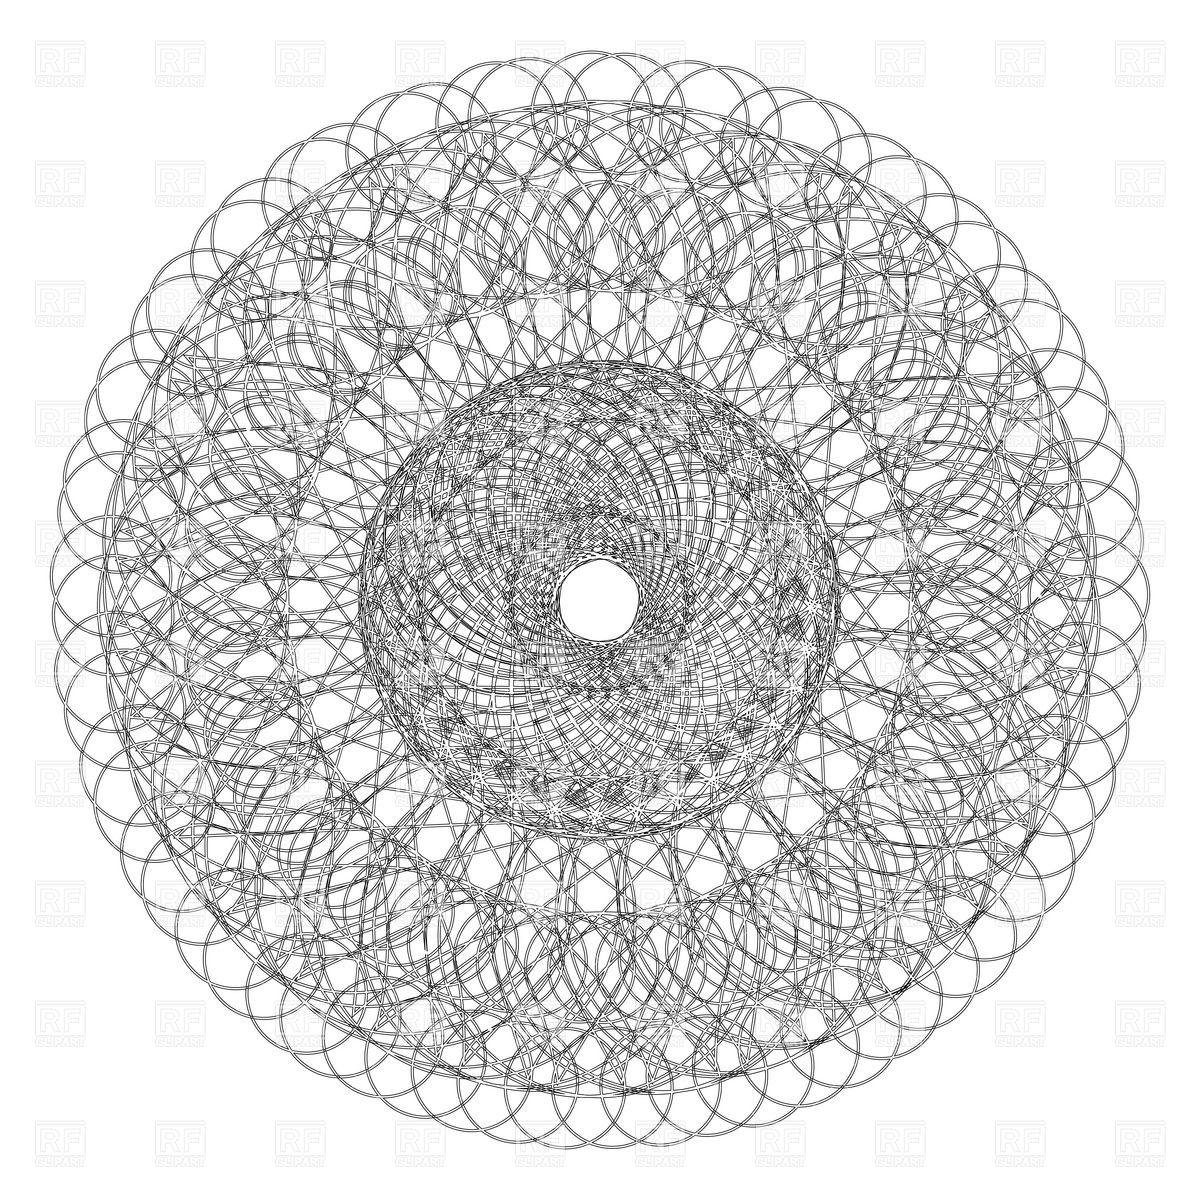 1200x1200 Decorative Round Lace Ornament Vector Image Vector Artwork Of